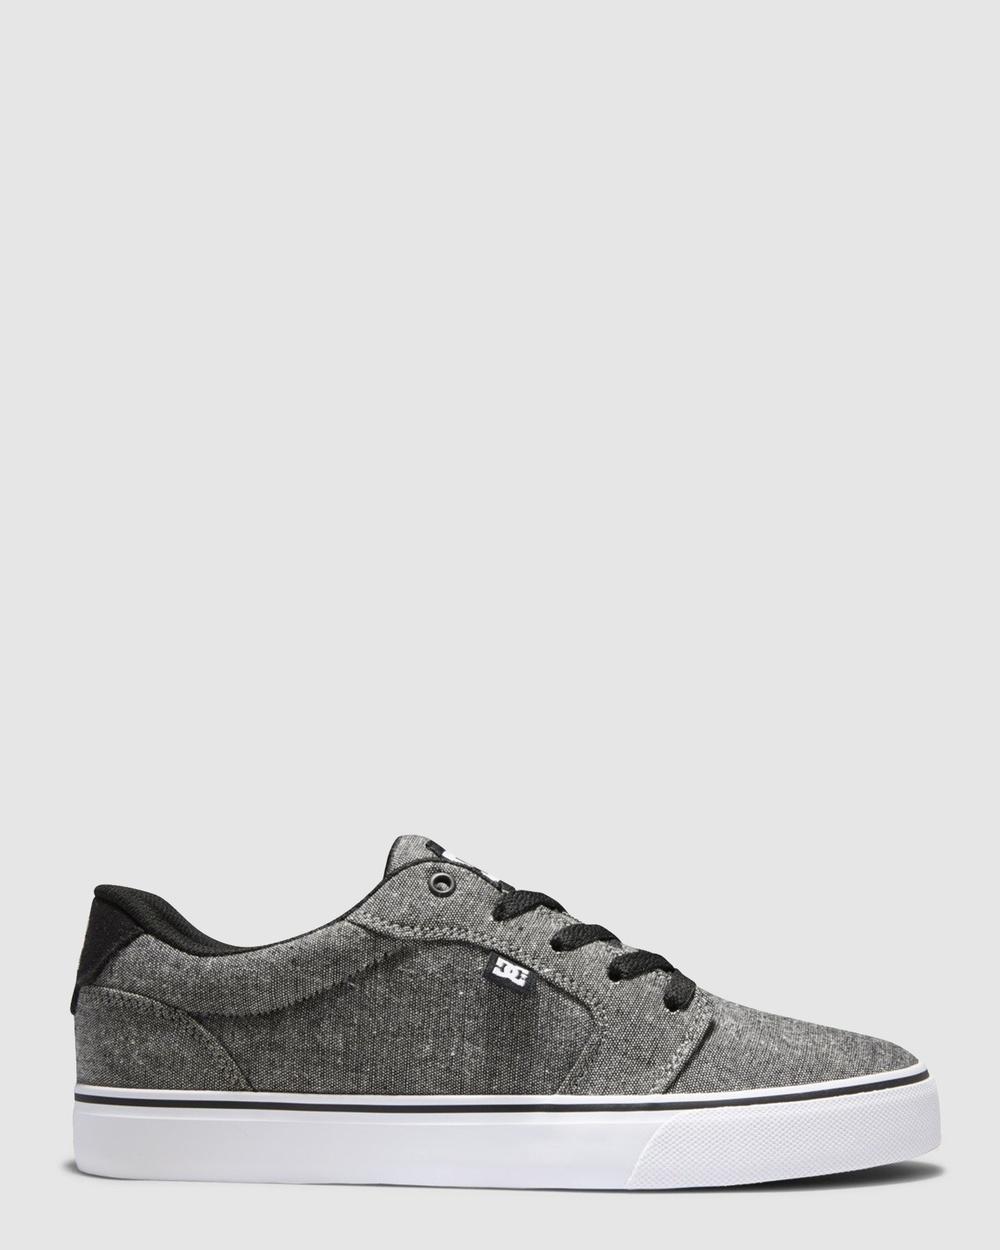 DC Shoes - Mens Anvil Shoe - Sneakers (BLACK DARK USED) Mens Anvil Shoe